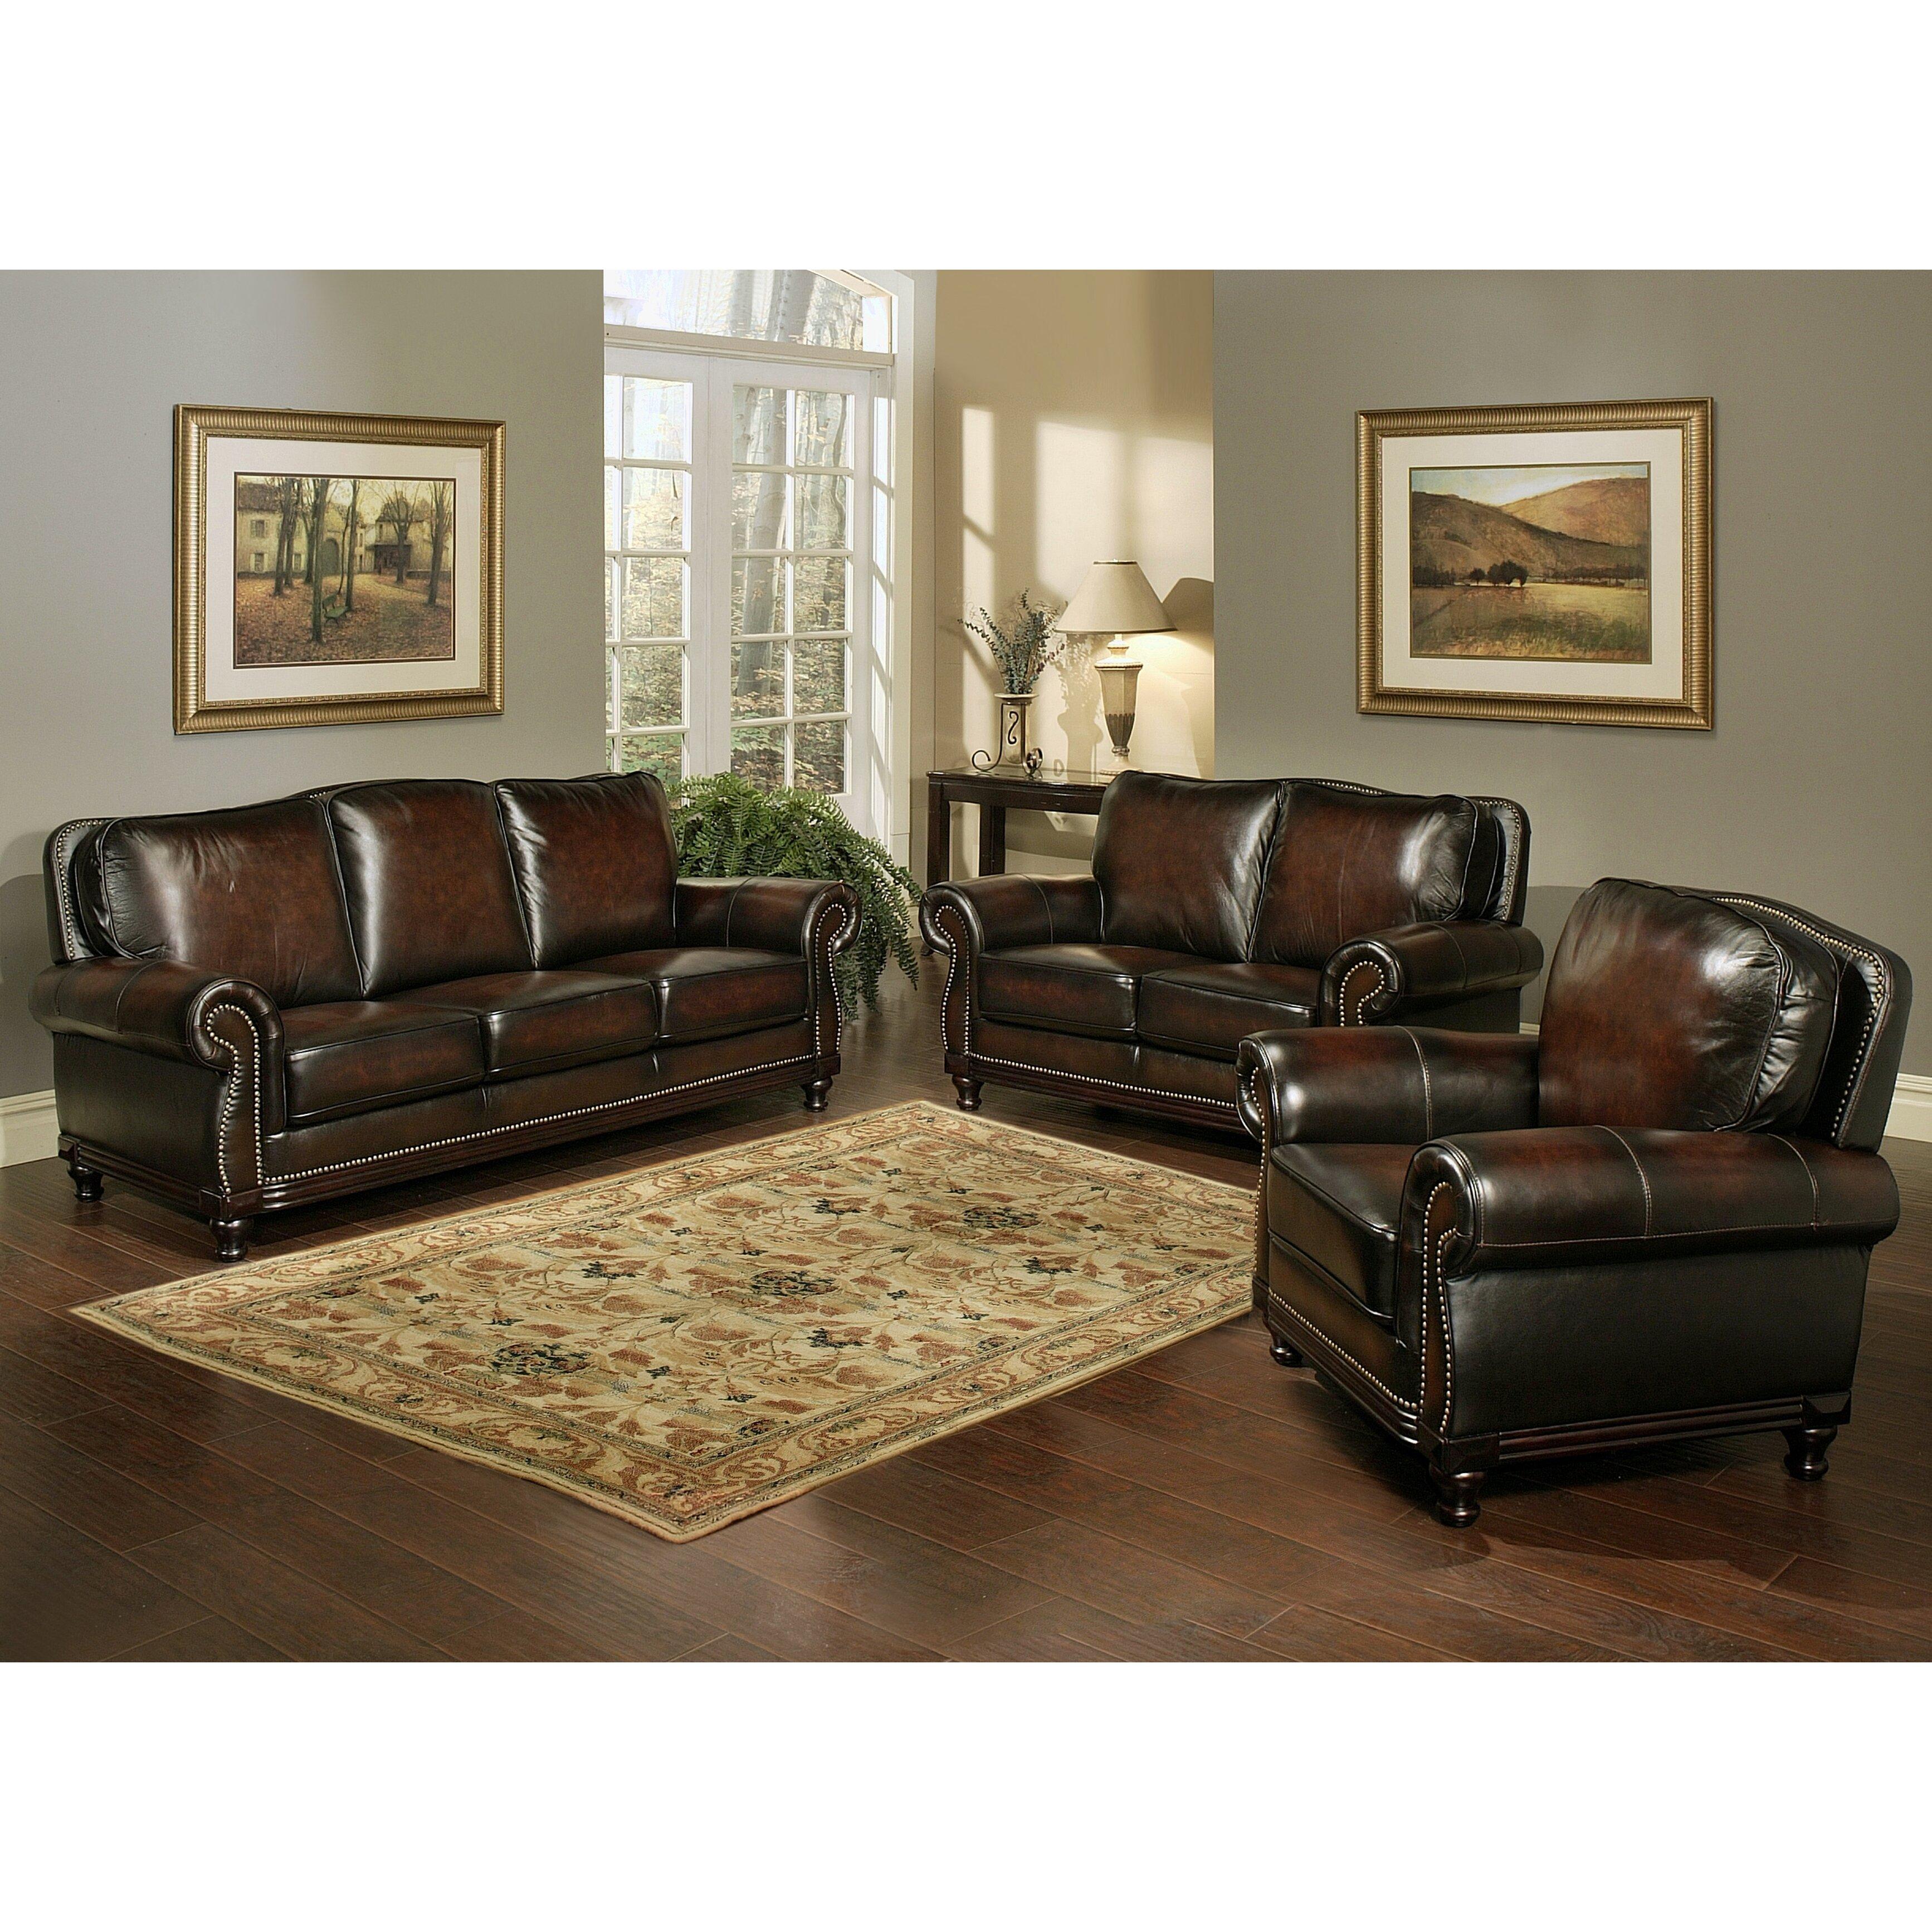 Abbyson Living Barrington Hand Rubbed Top Grain Leather Sofa